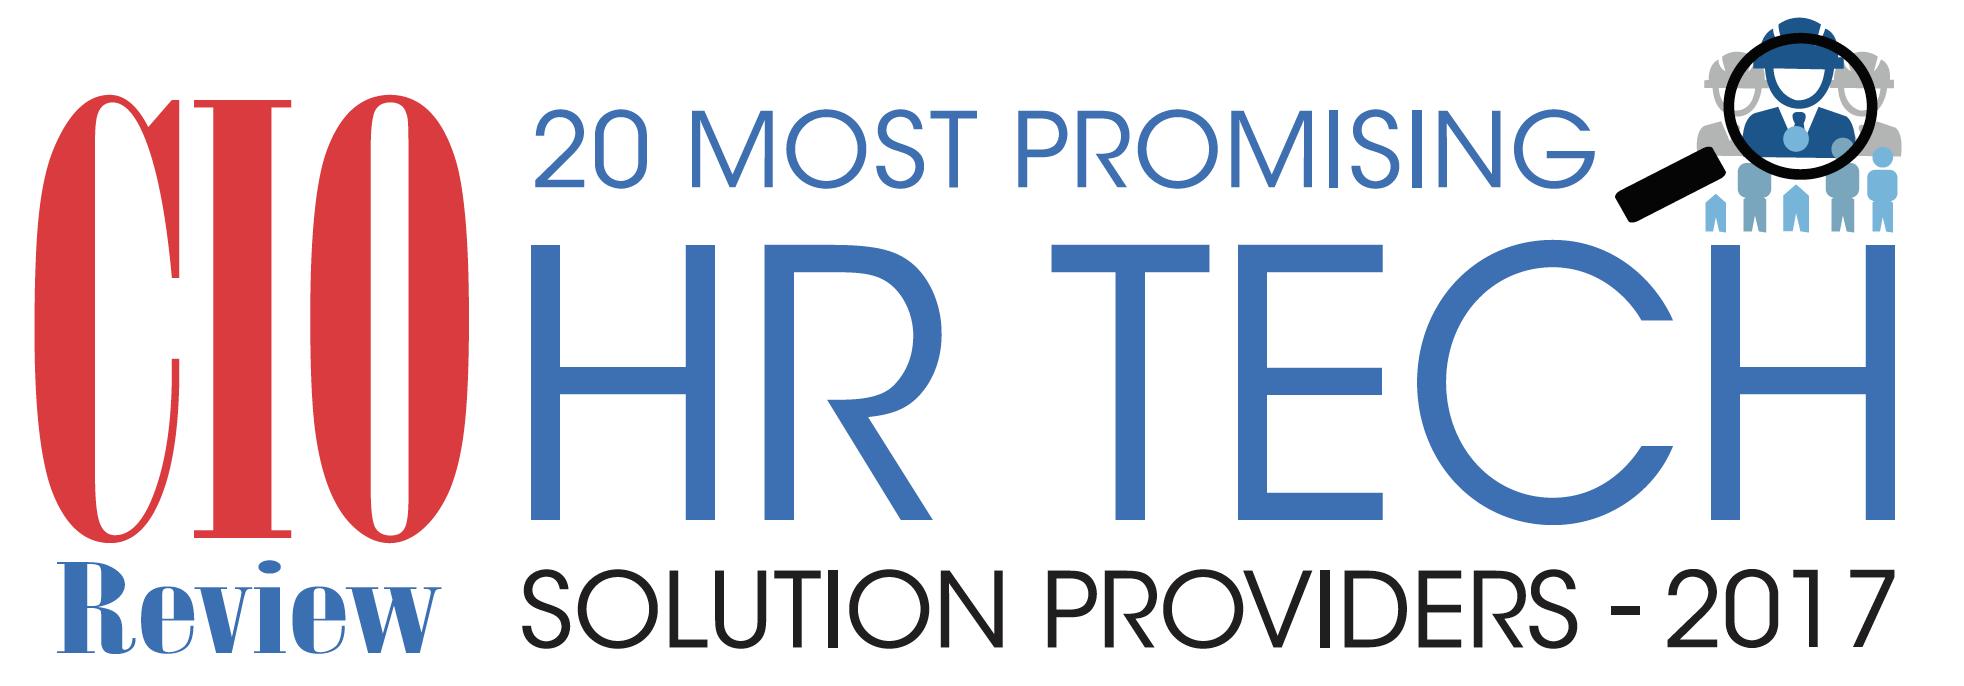 CIO review HR Tech